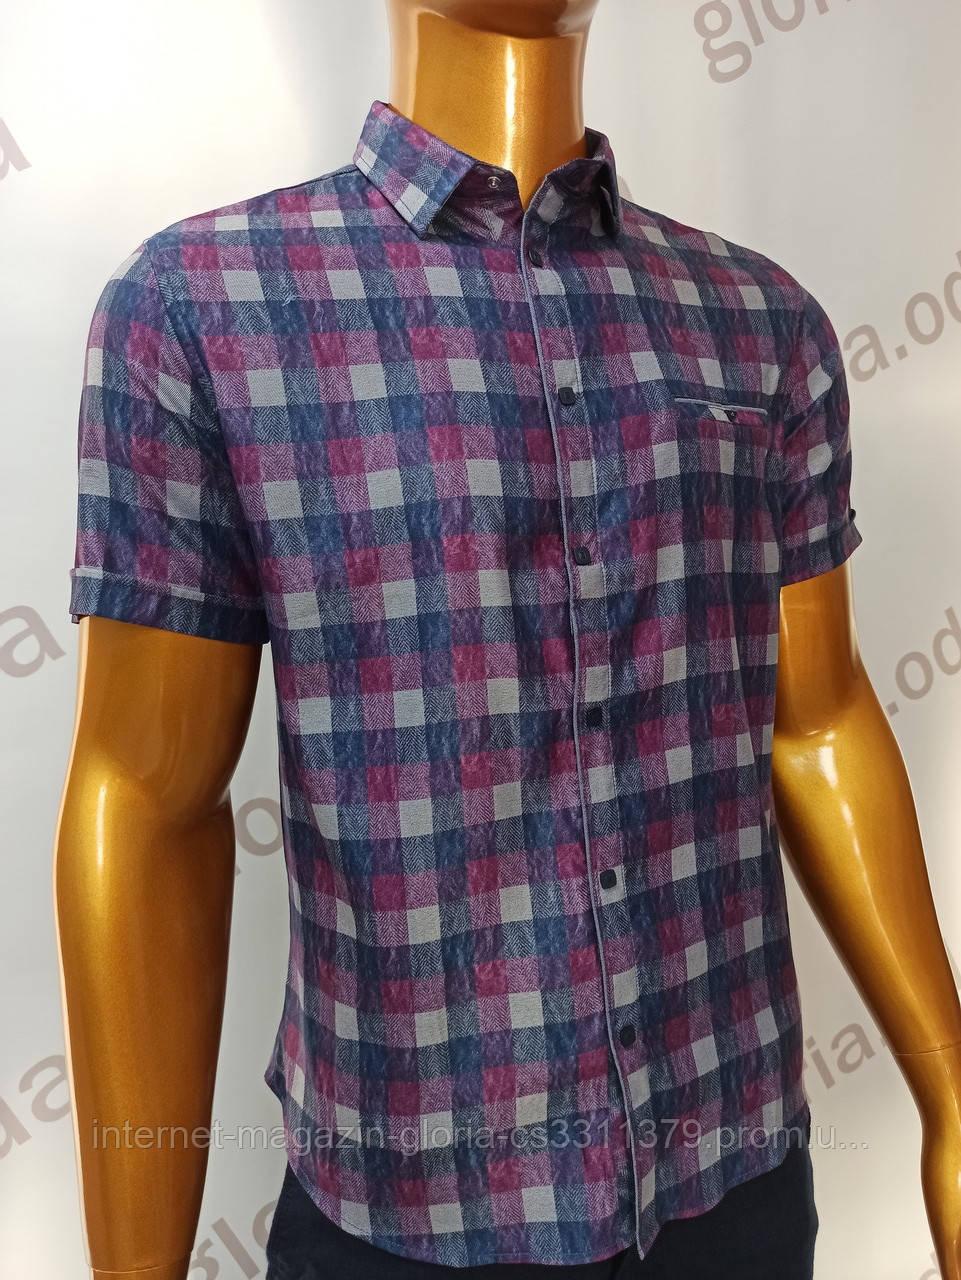 Мужская рубашка Amato. AG.KG19585(f). Размеры: L,XL(2),XXL.